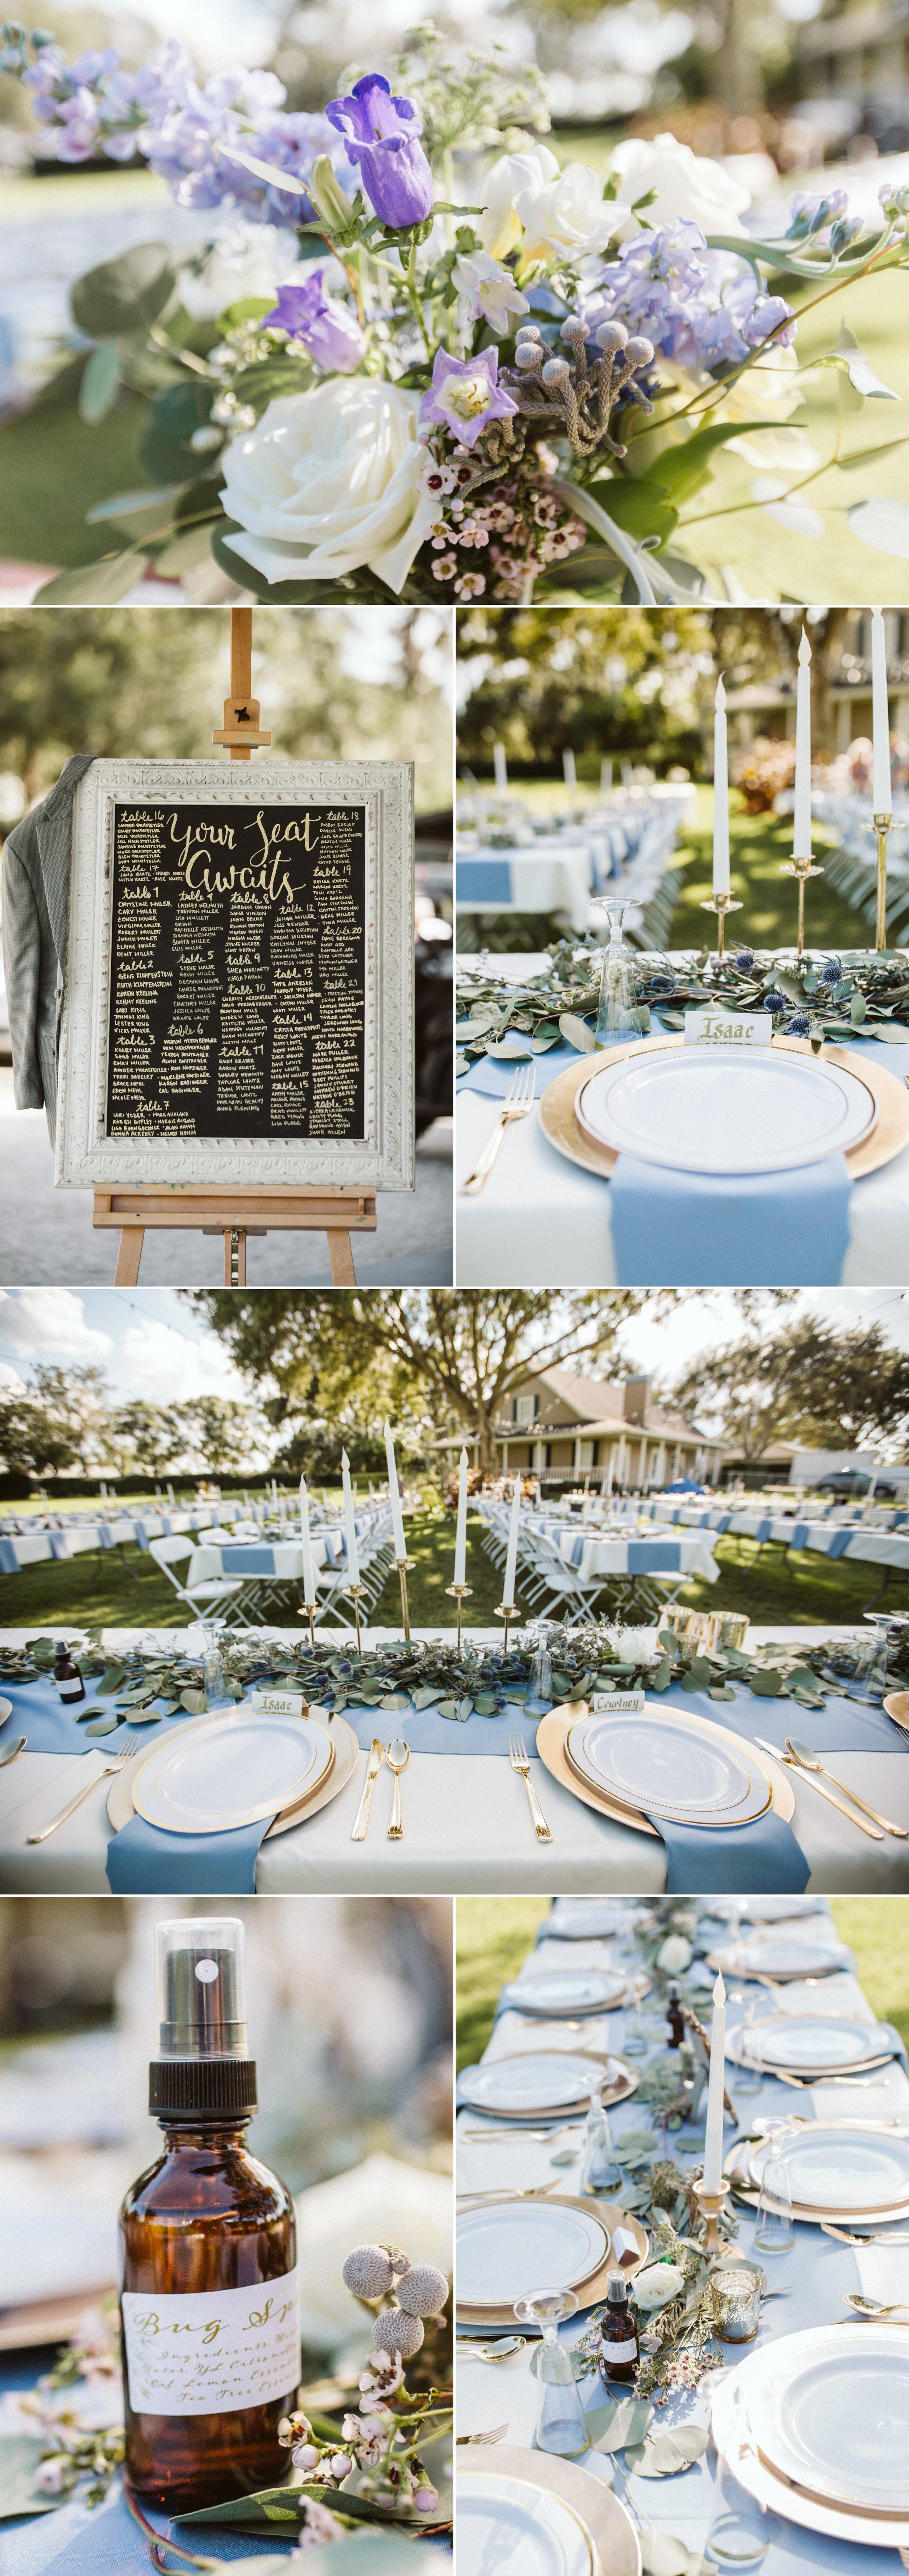 Romantic Floral Outdoor Field Chapel Wedding- Sarasota Florida- Courtney & Isaac14.jpg